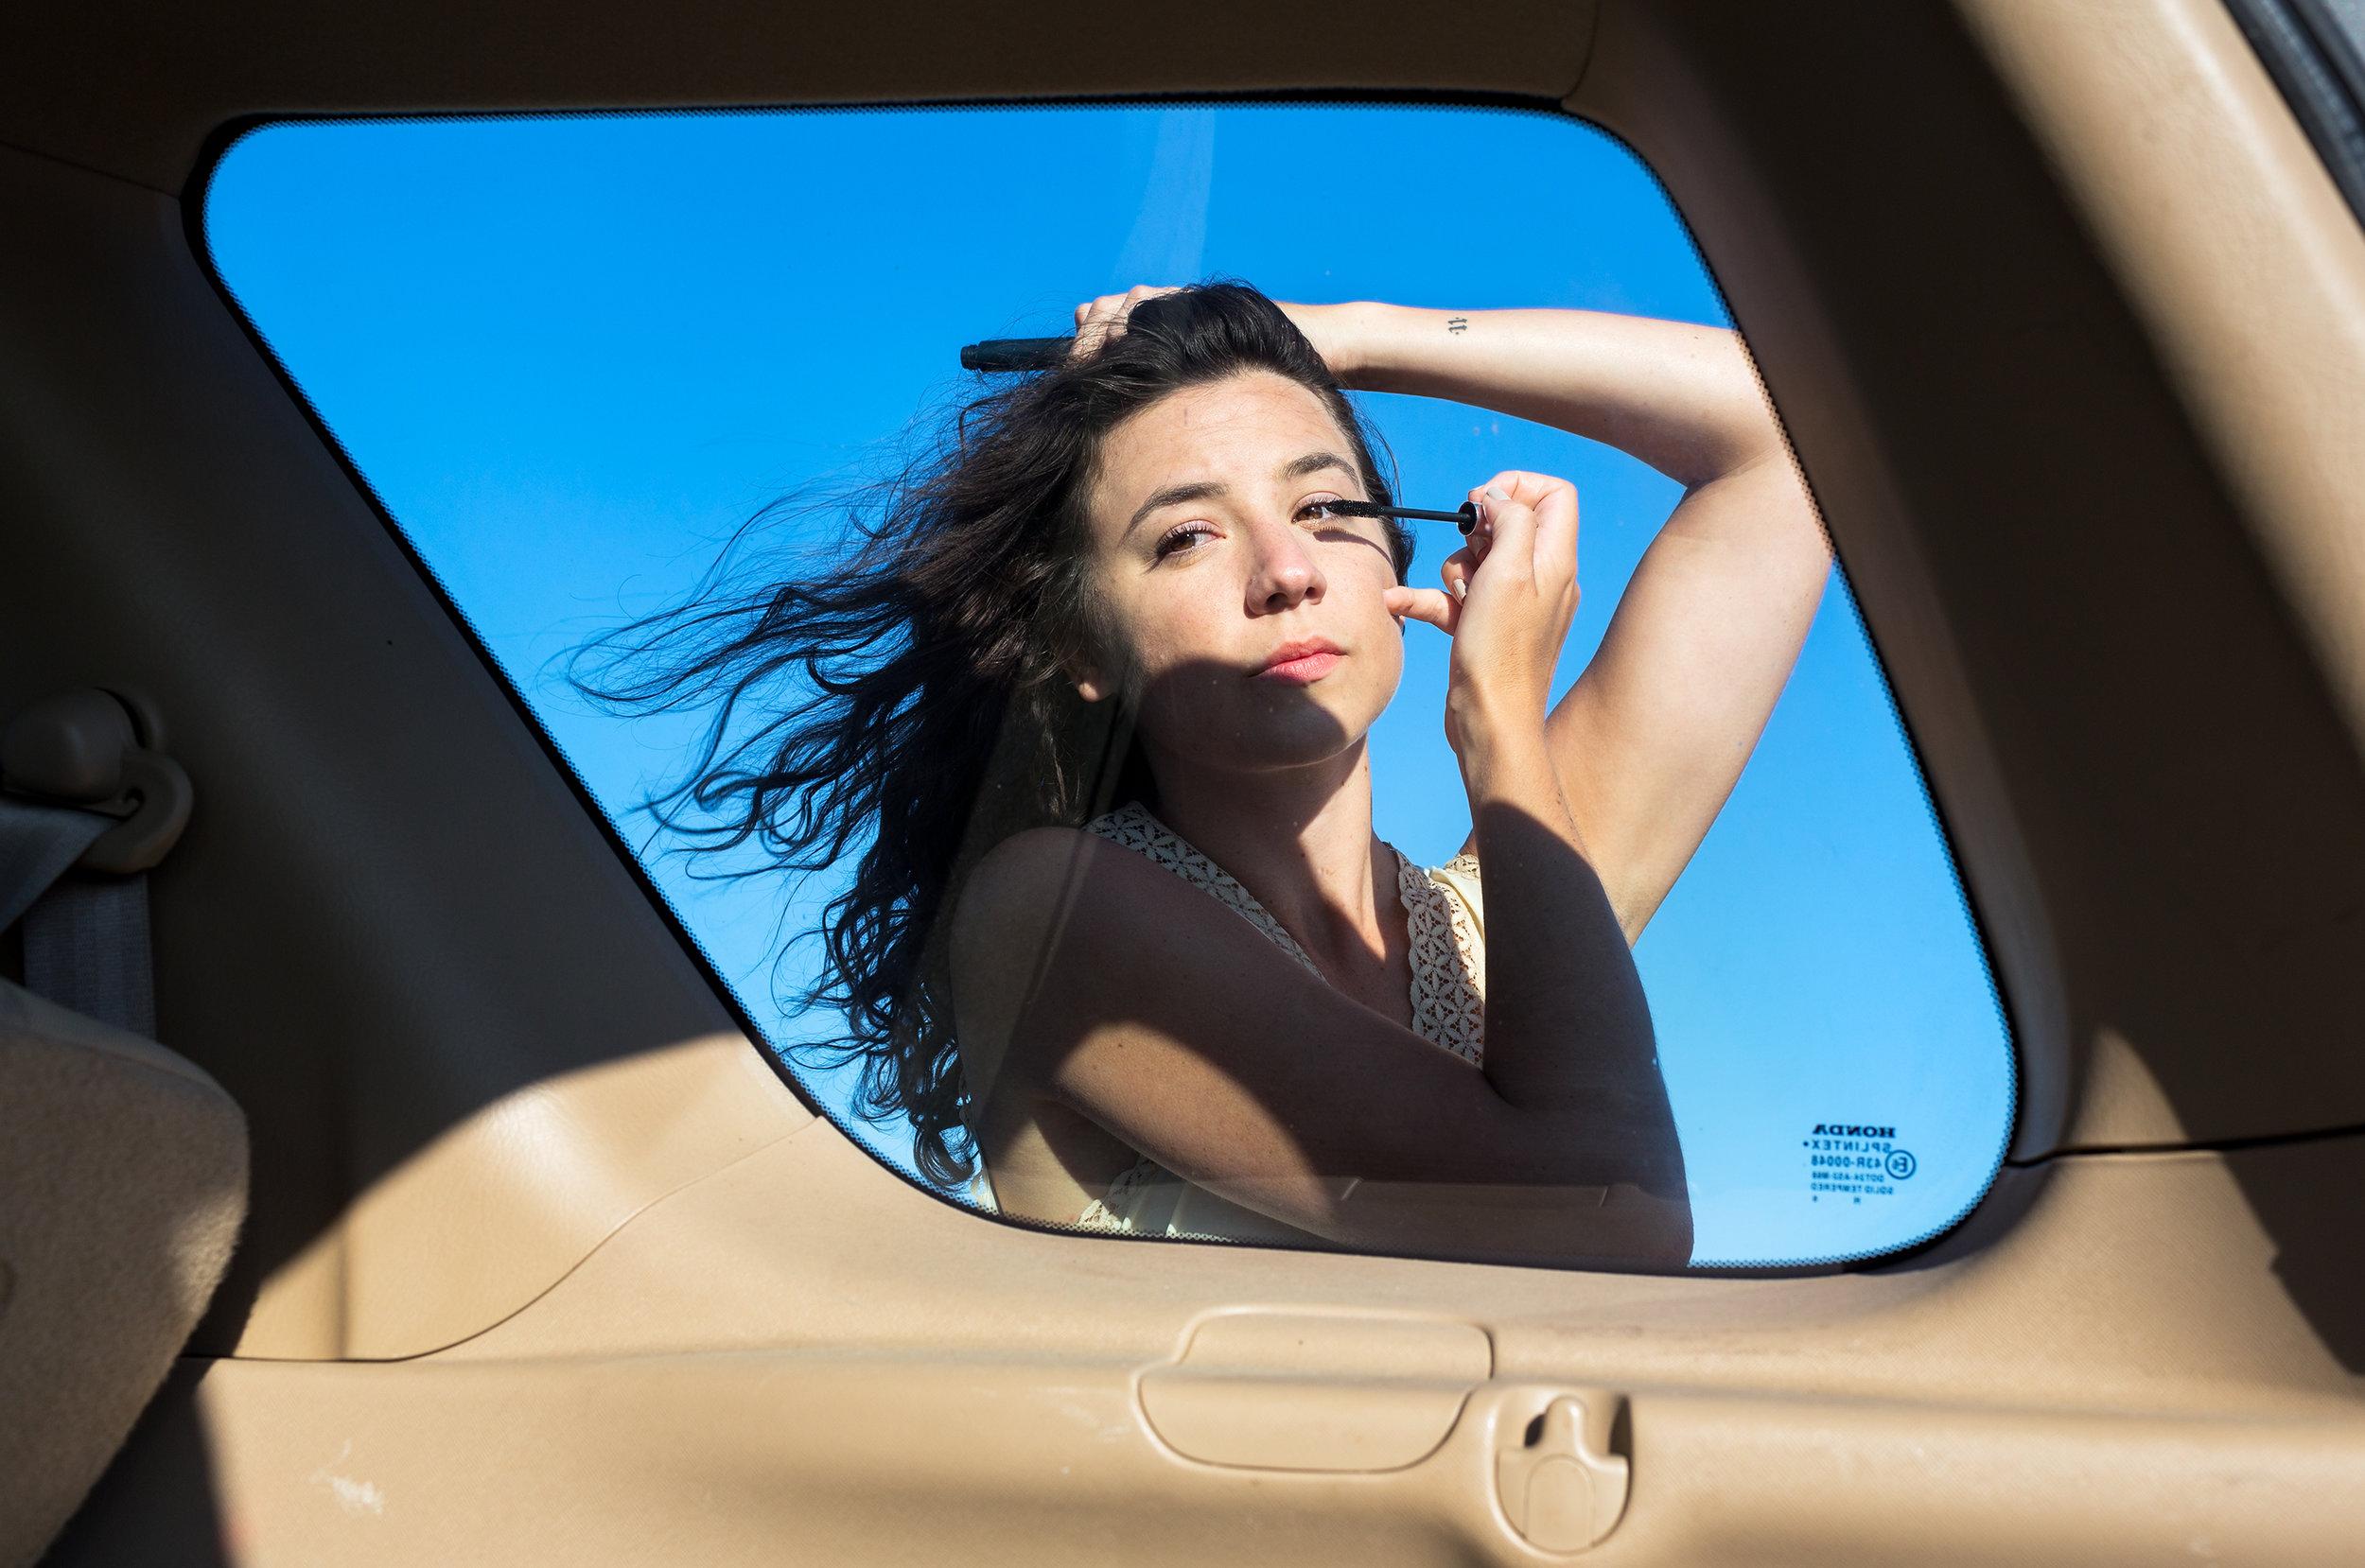 © Isabel Magowan, Through the Car Window